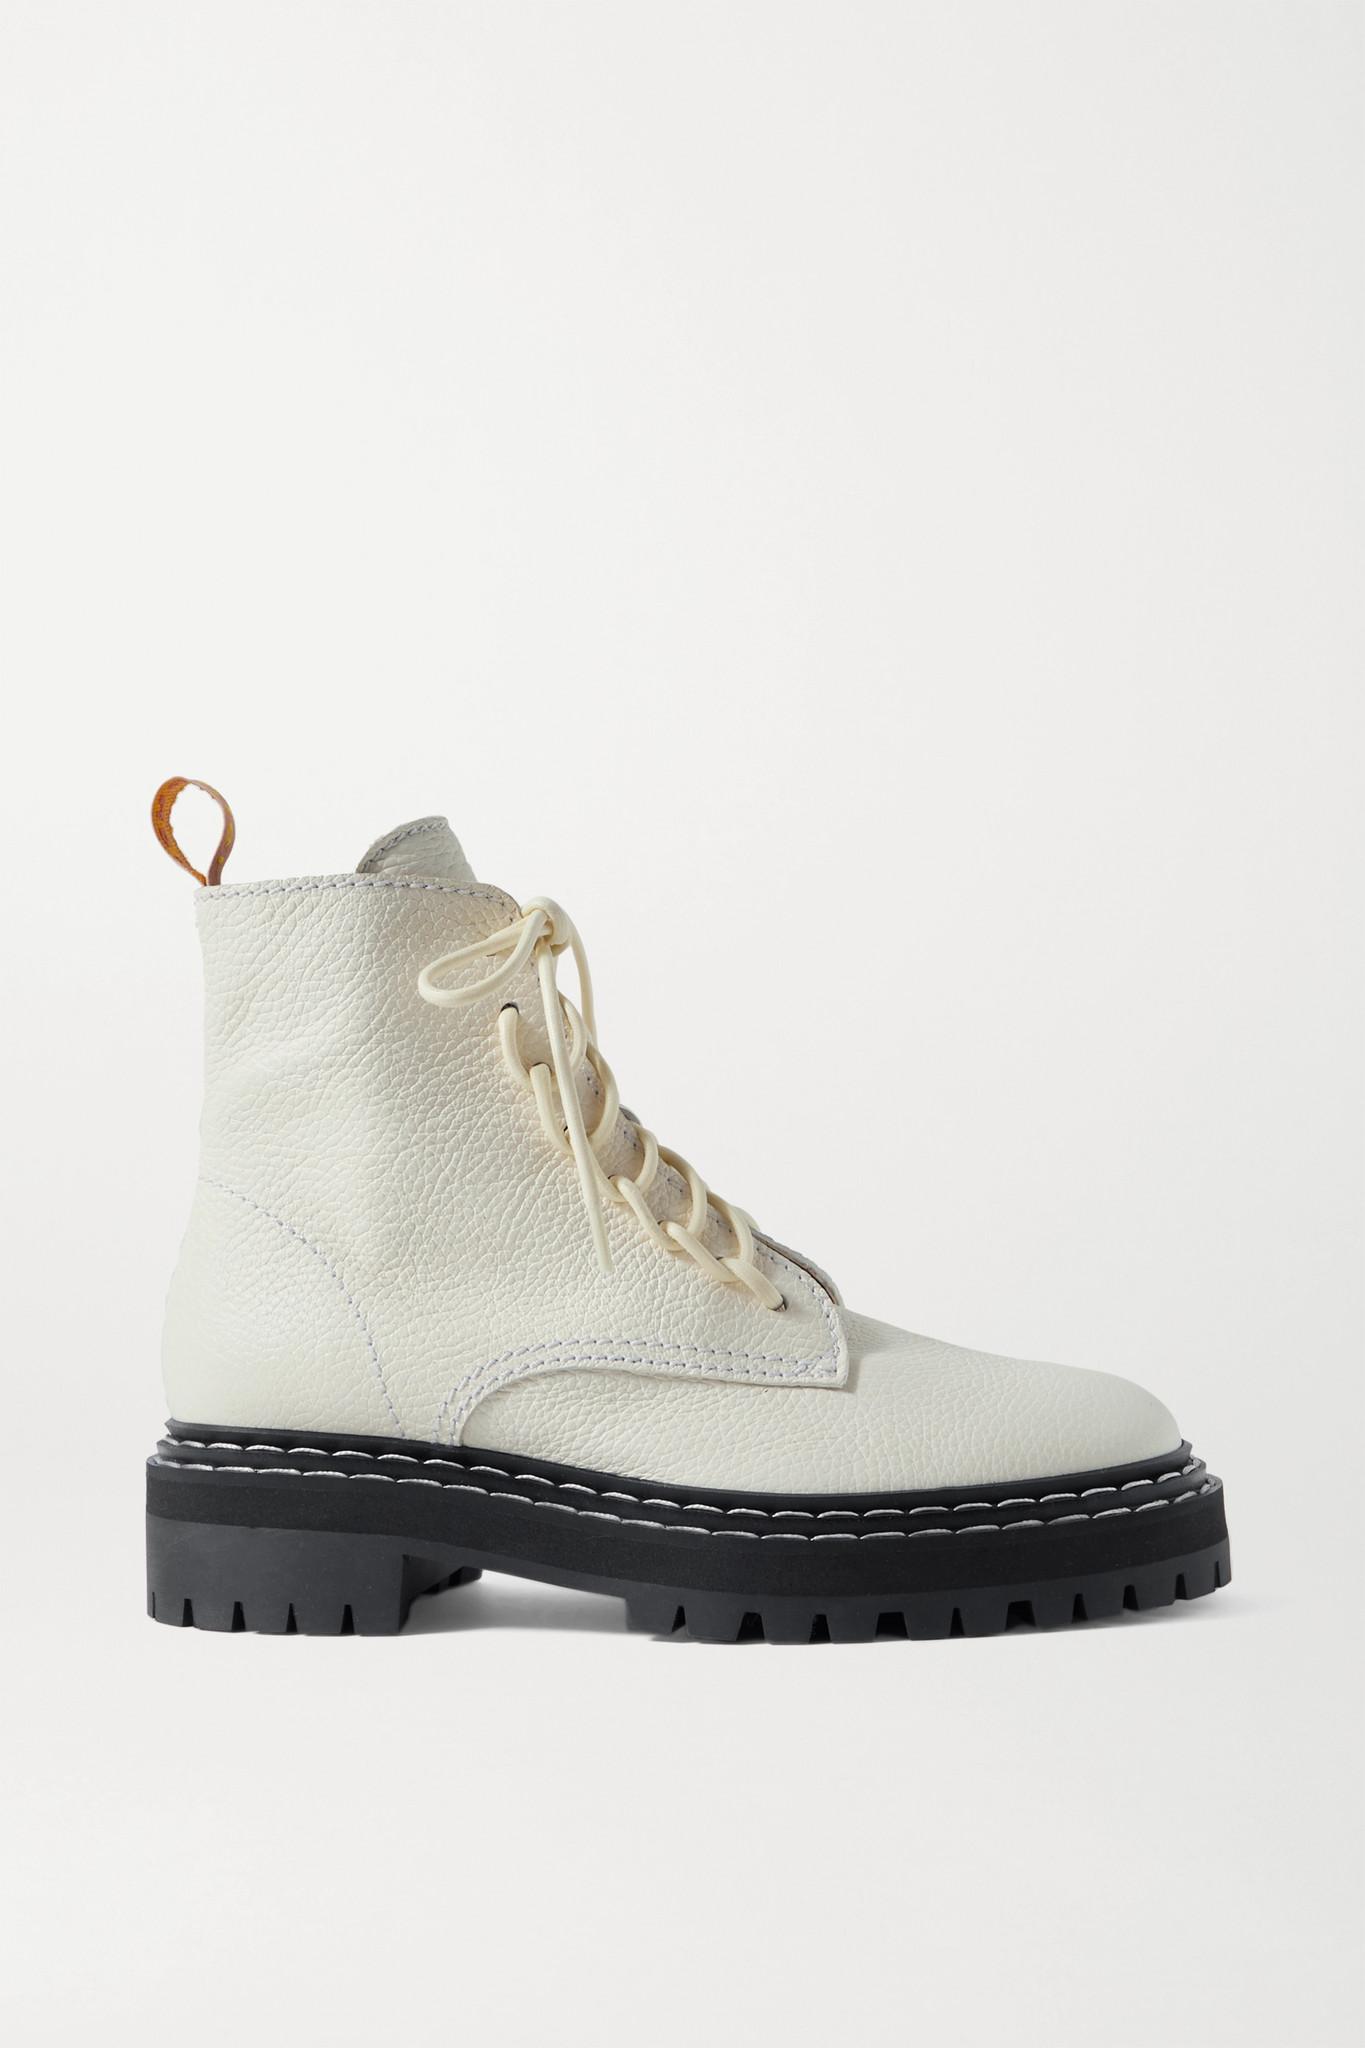 PROENZA SCHOULER - 纹理皮革踝靴 - 白色 - IT35